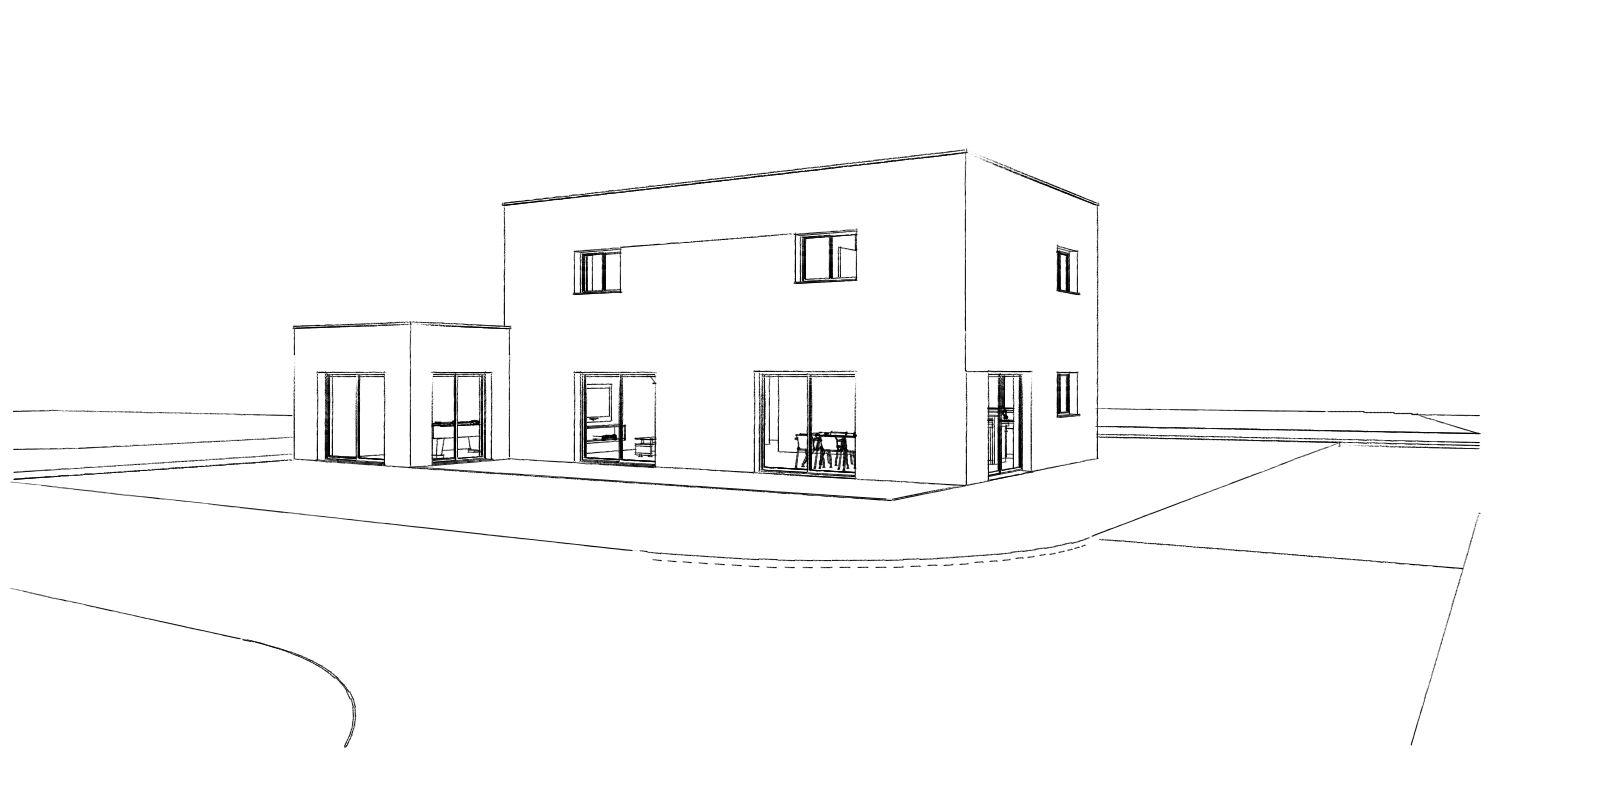 permis de construire architecte Lille 5